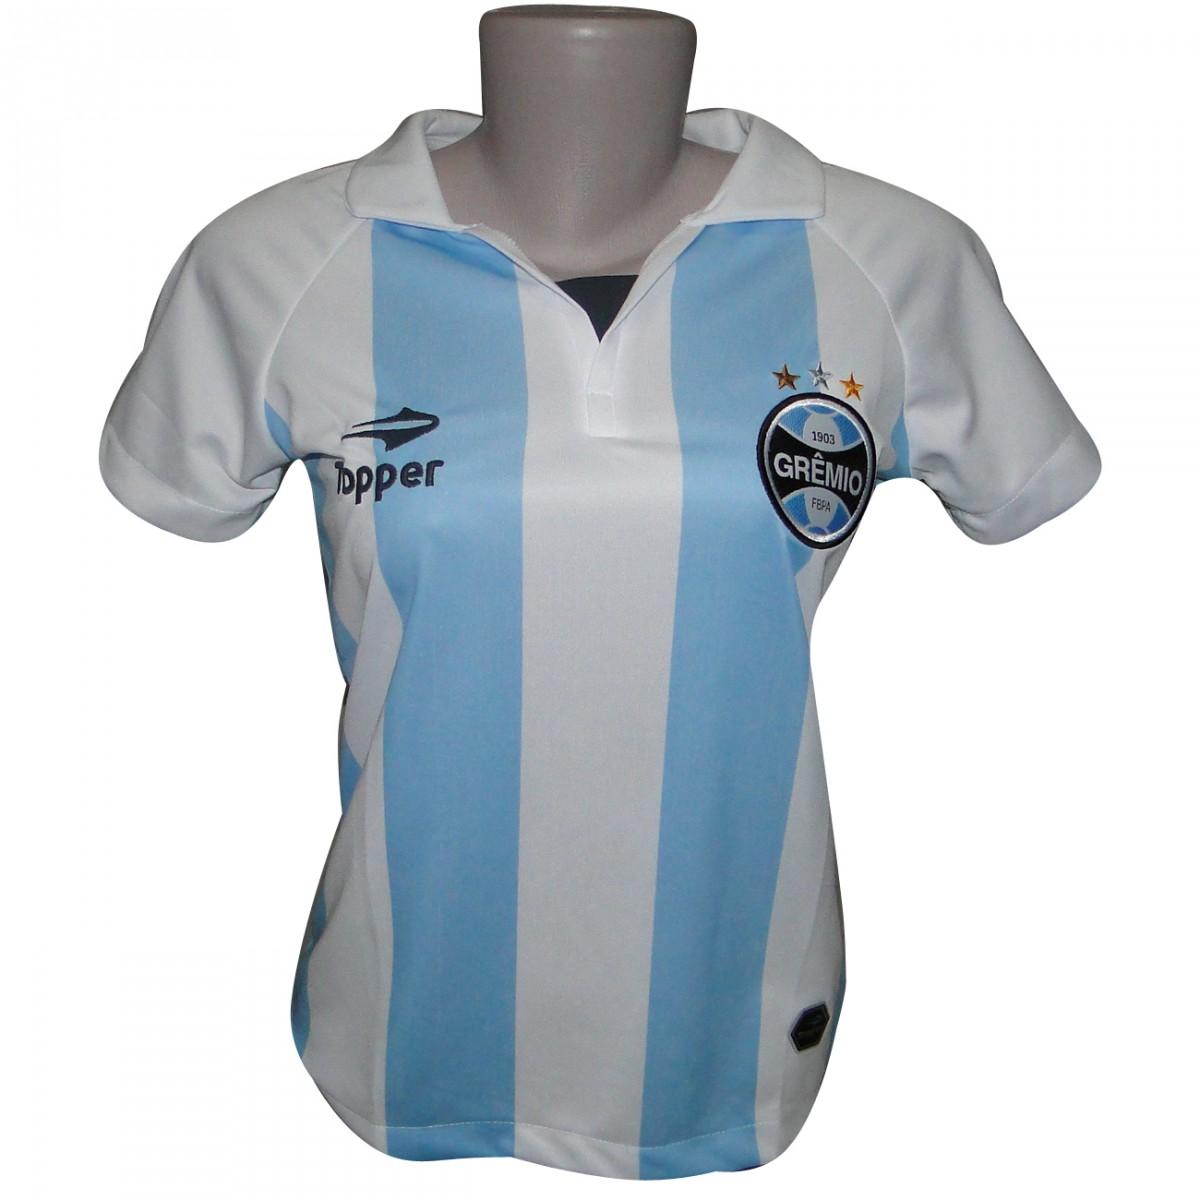 44e161a774a Baby Look Gremio Topper Alma Castelhana 2012 C1095F - Branco  Azul . 146dd35a59bbf